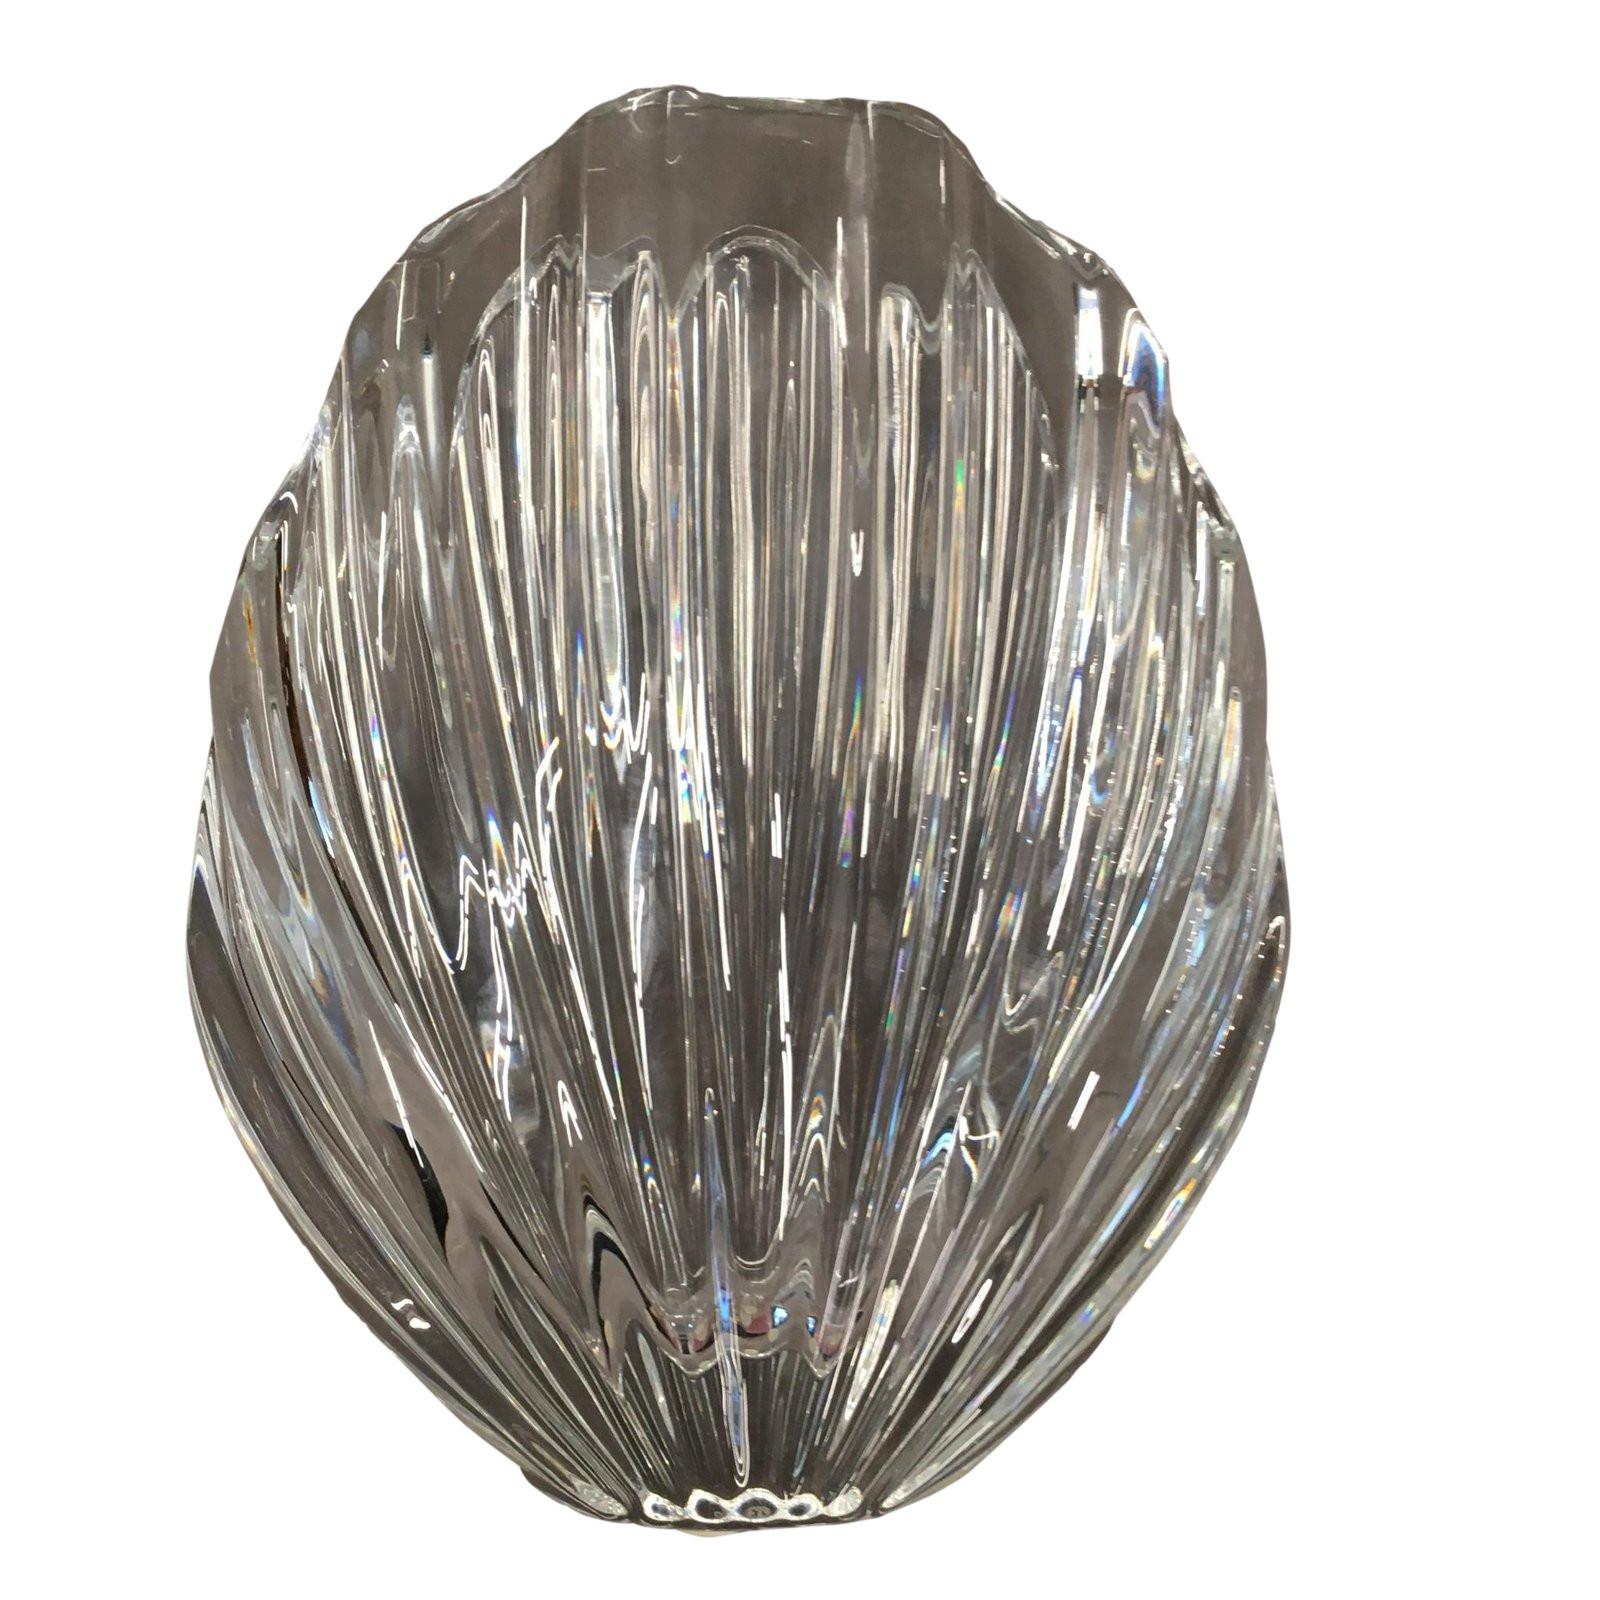 baccarat bud vase of robert rigot for baccarat shell crystal vase chairish with robert rigot for baccarat shell crystal vase 5047